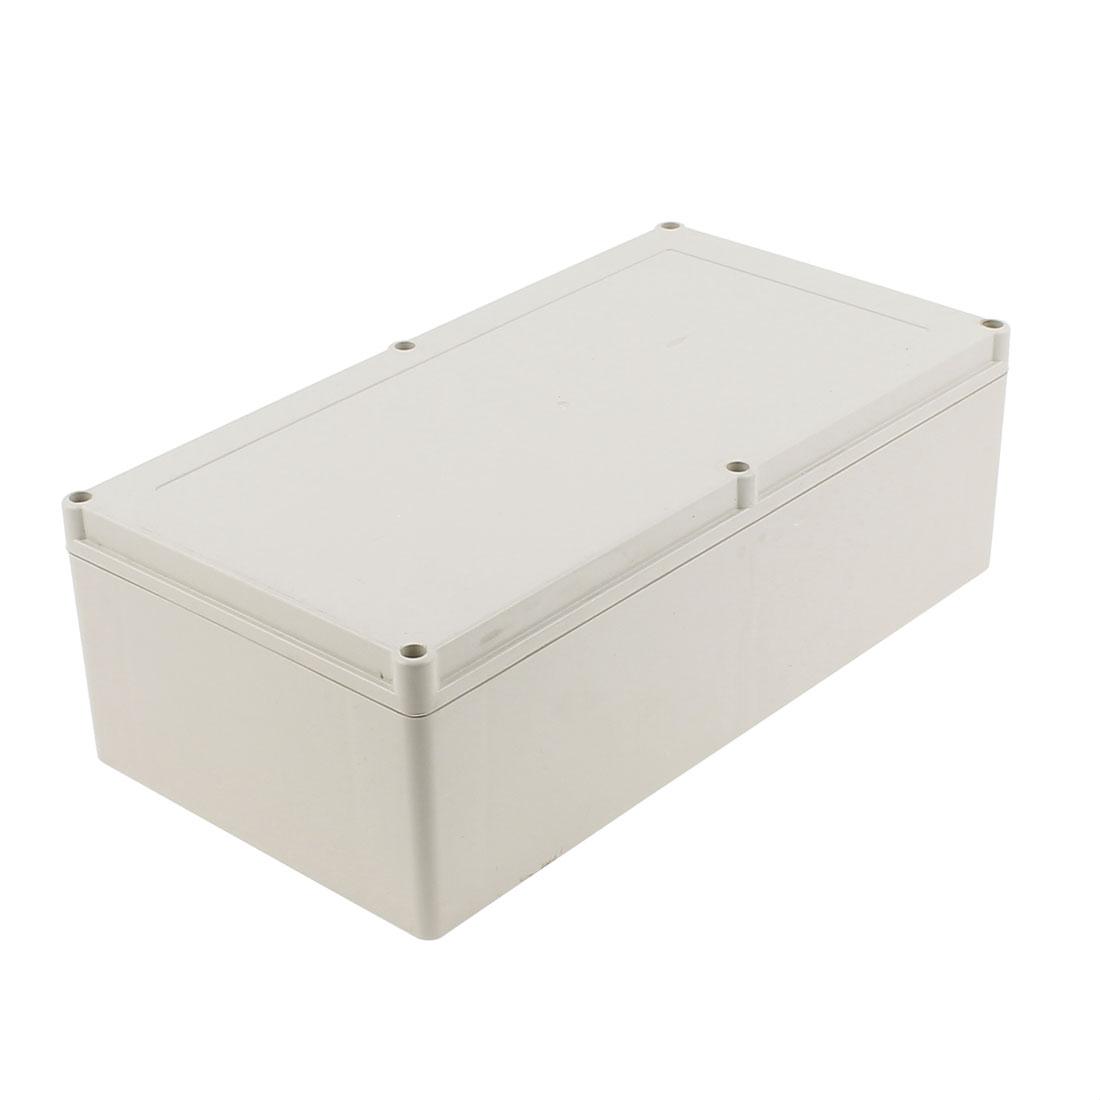 325 x 170 x 103mm Dustproof IP65 Junction Box Terminal Connection Box Enclosure